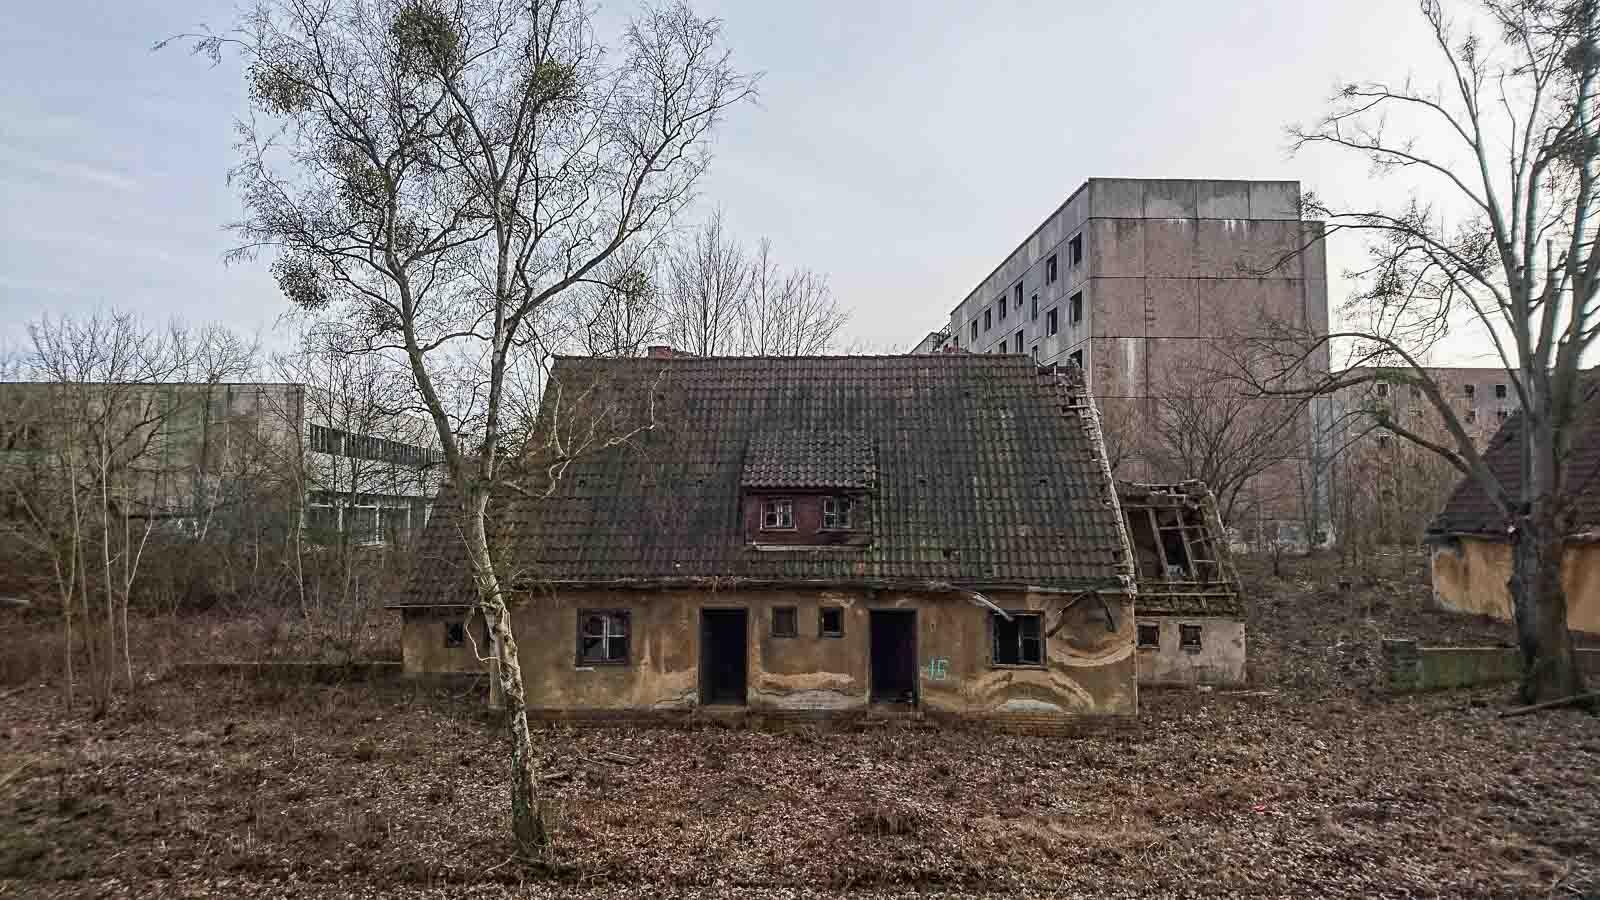 Verlassener Ort Sowjetische Kaserne Brandenburg